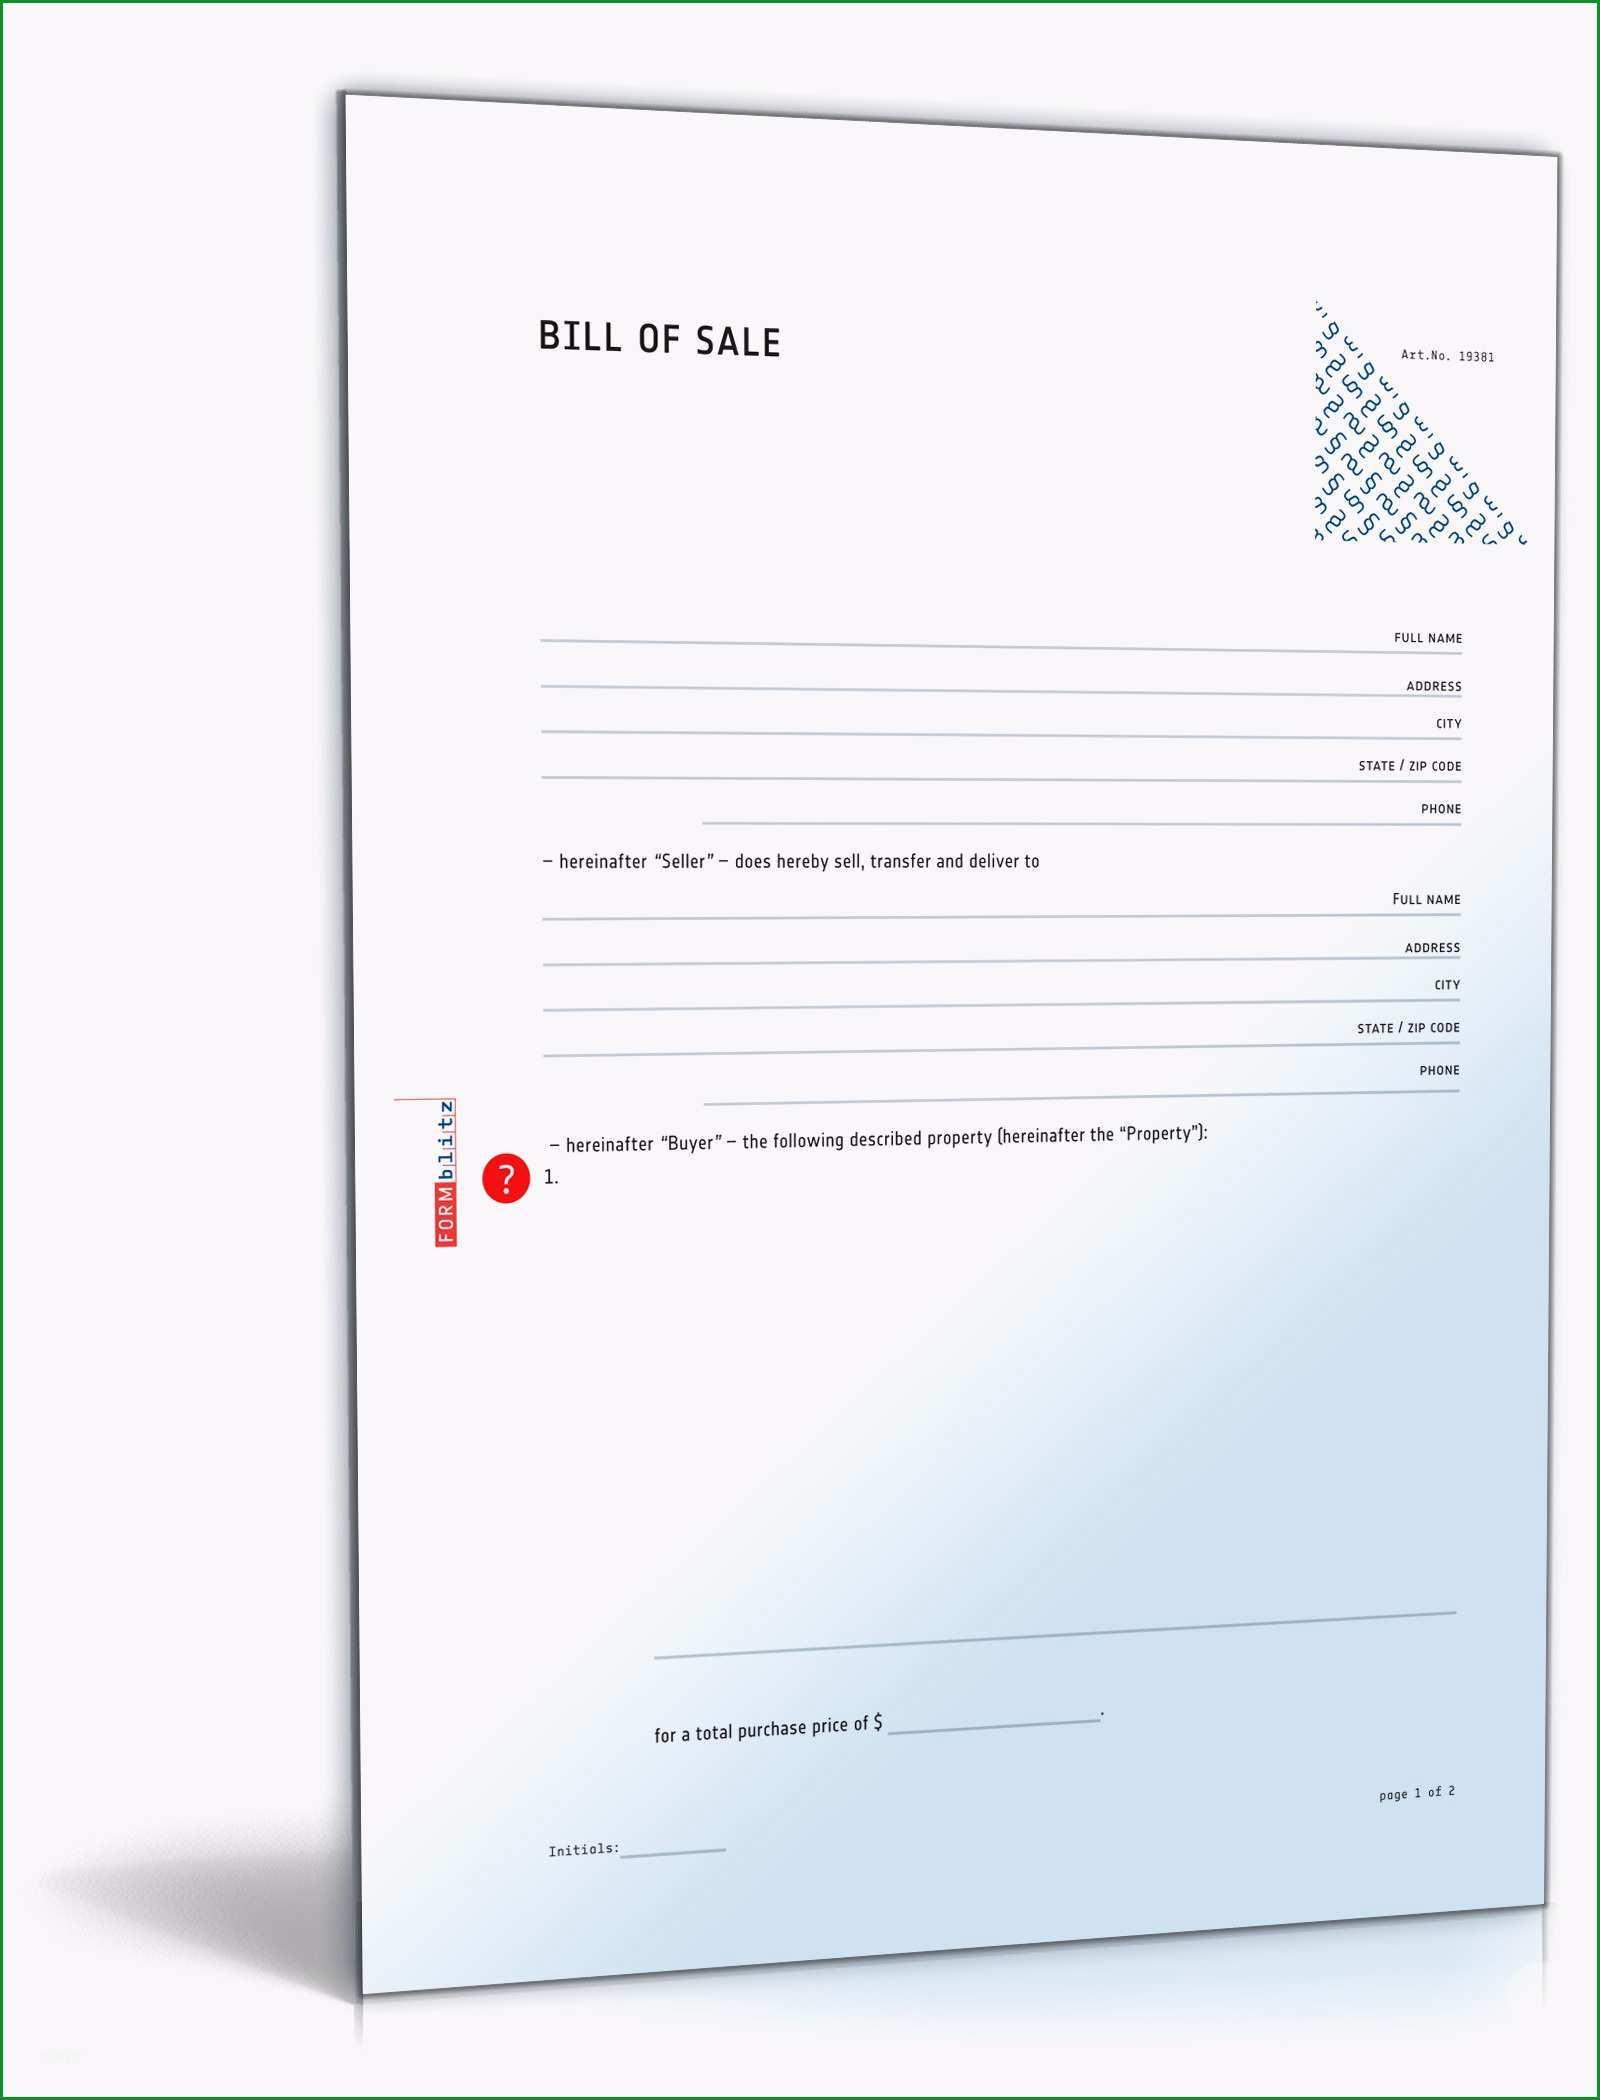 general bill of sale